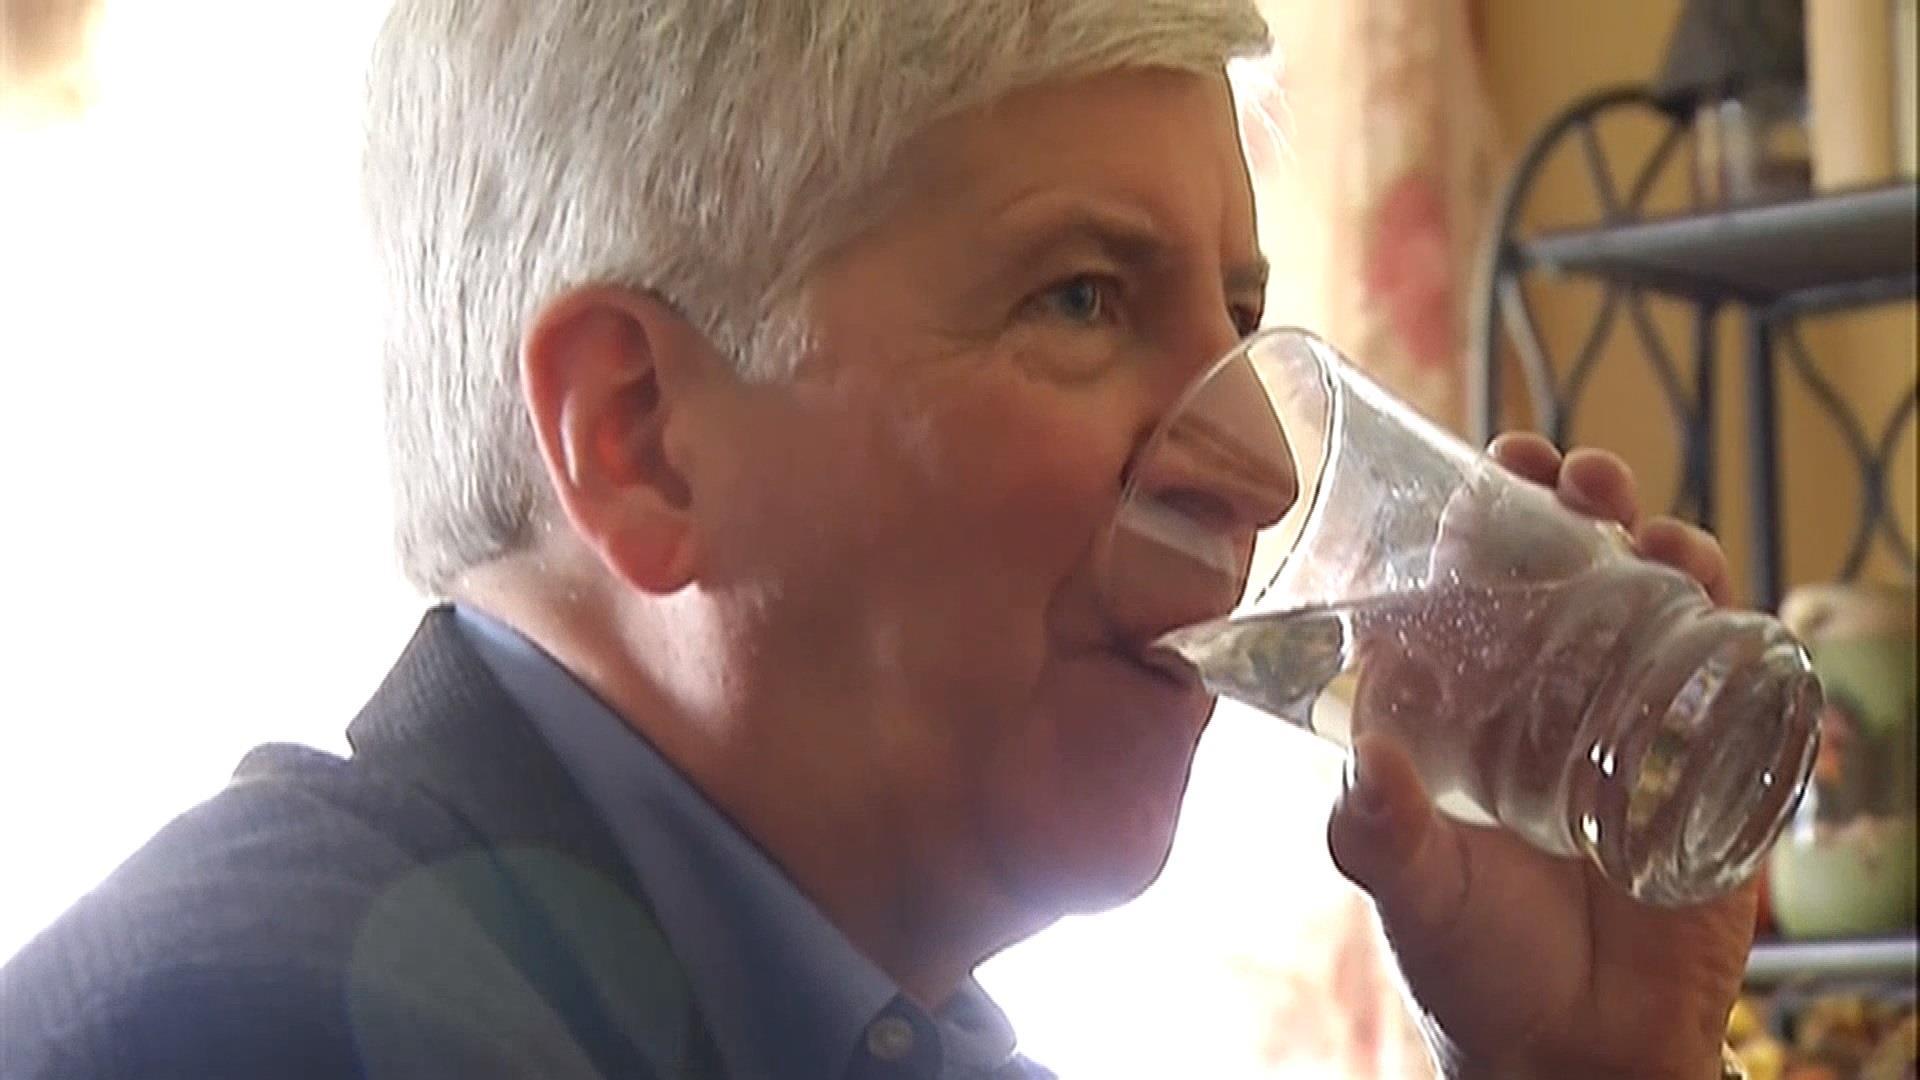 Snyder: I'll drink Flint water for 1 month